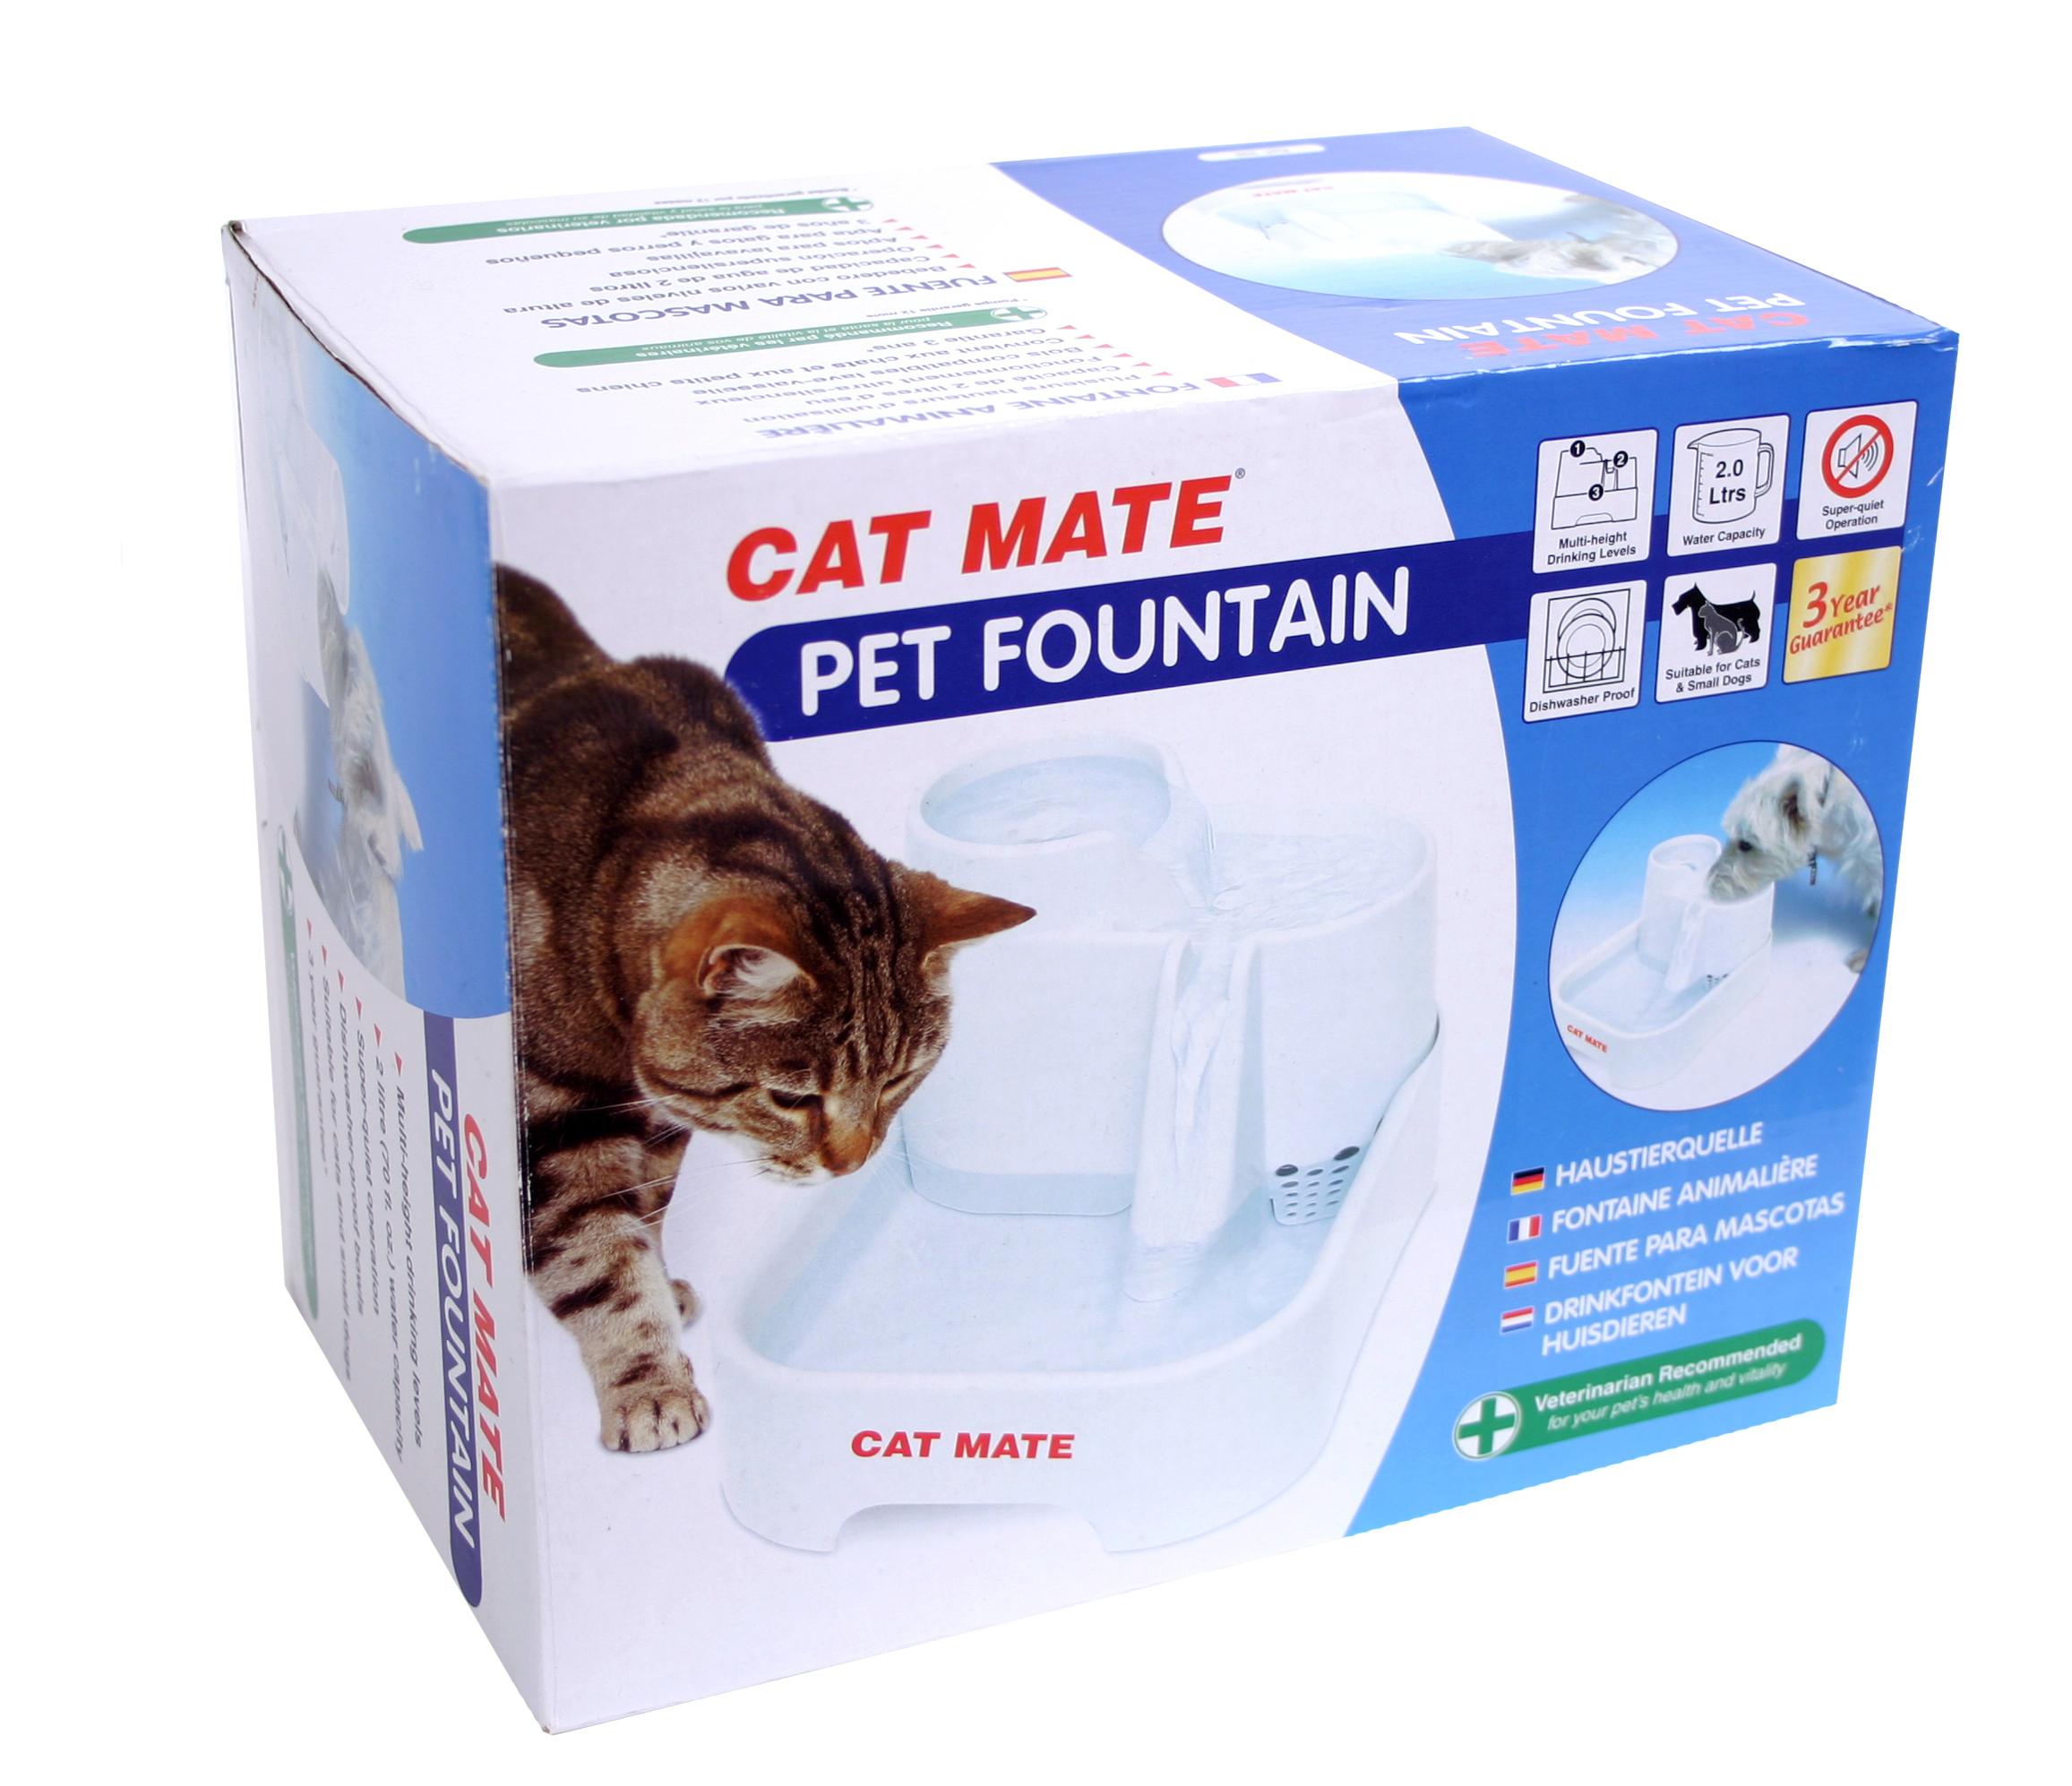 Vannfontene CatMate